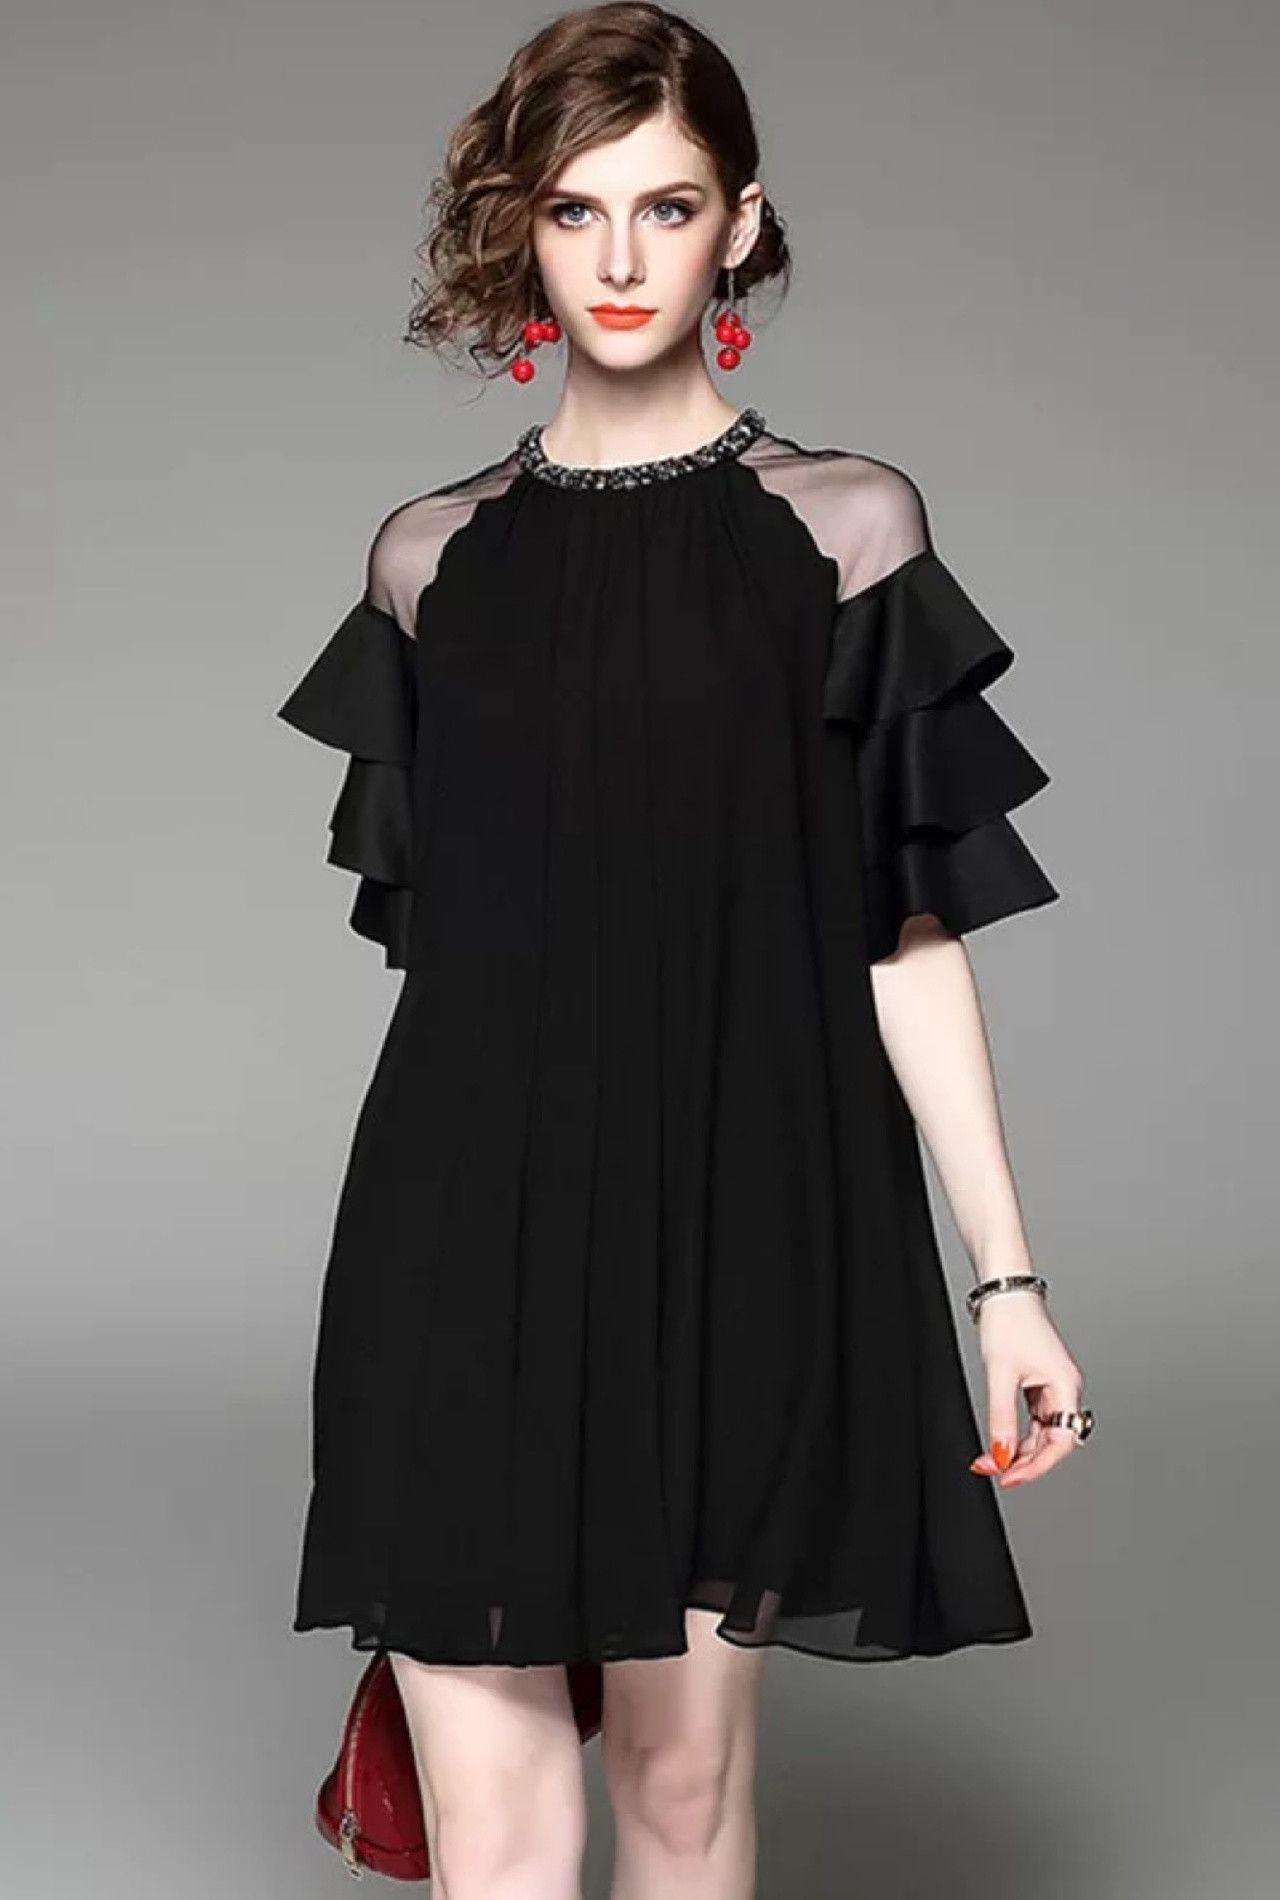 Beaded A Line Dress W Ruffled Sleeves The Dress Moda Stilleri Ve Boncuklu Elbiseler